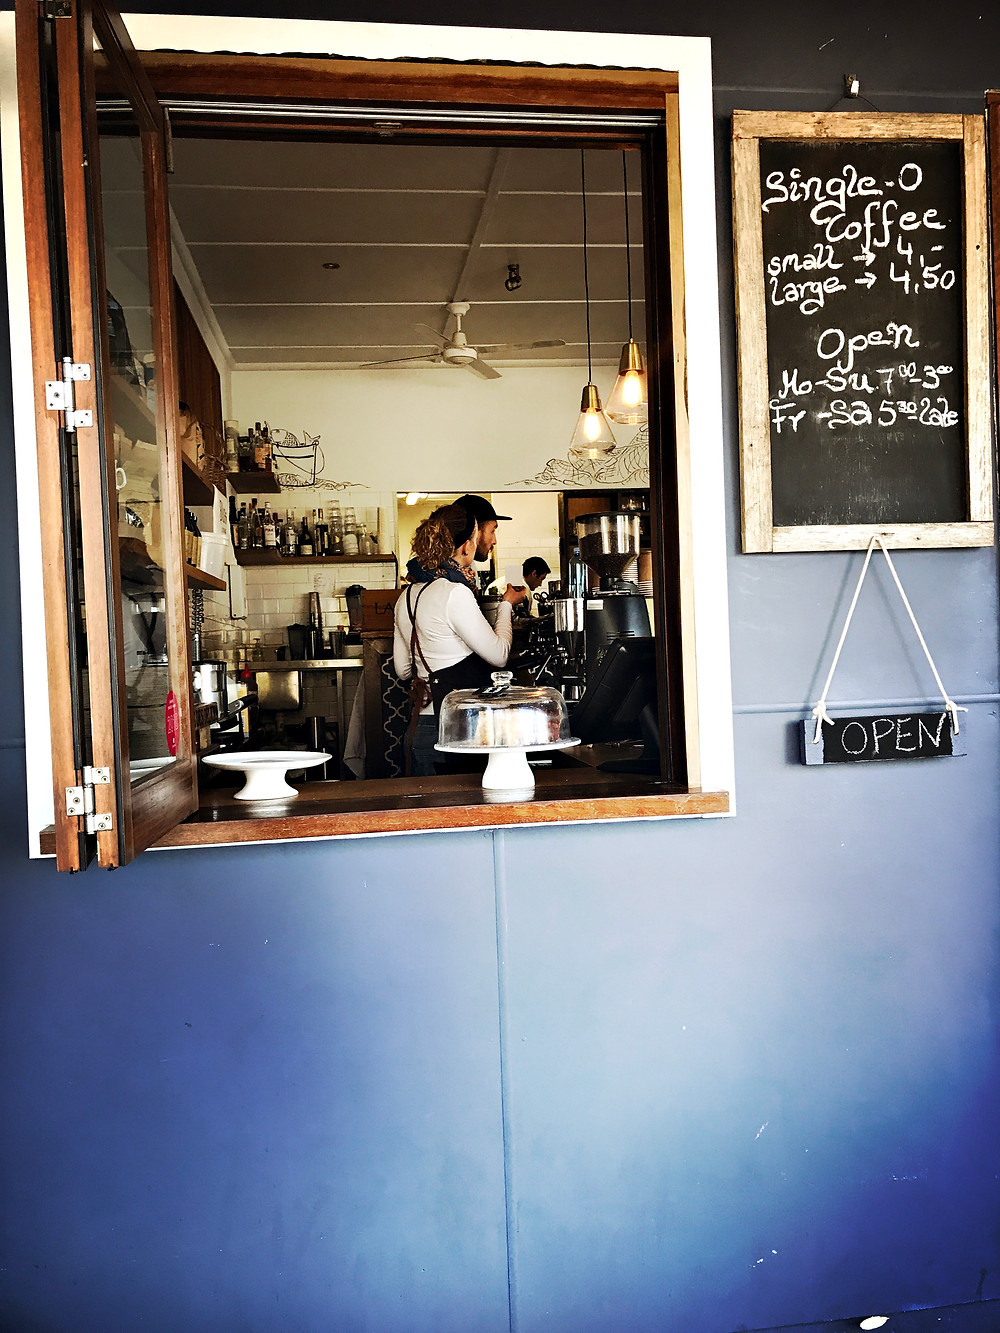 clovar-creative-the-blue-swimmer-restaurant-gerroa-shoalhaven-single-o-coffee